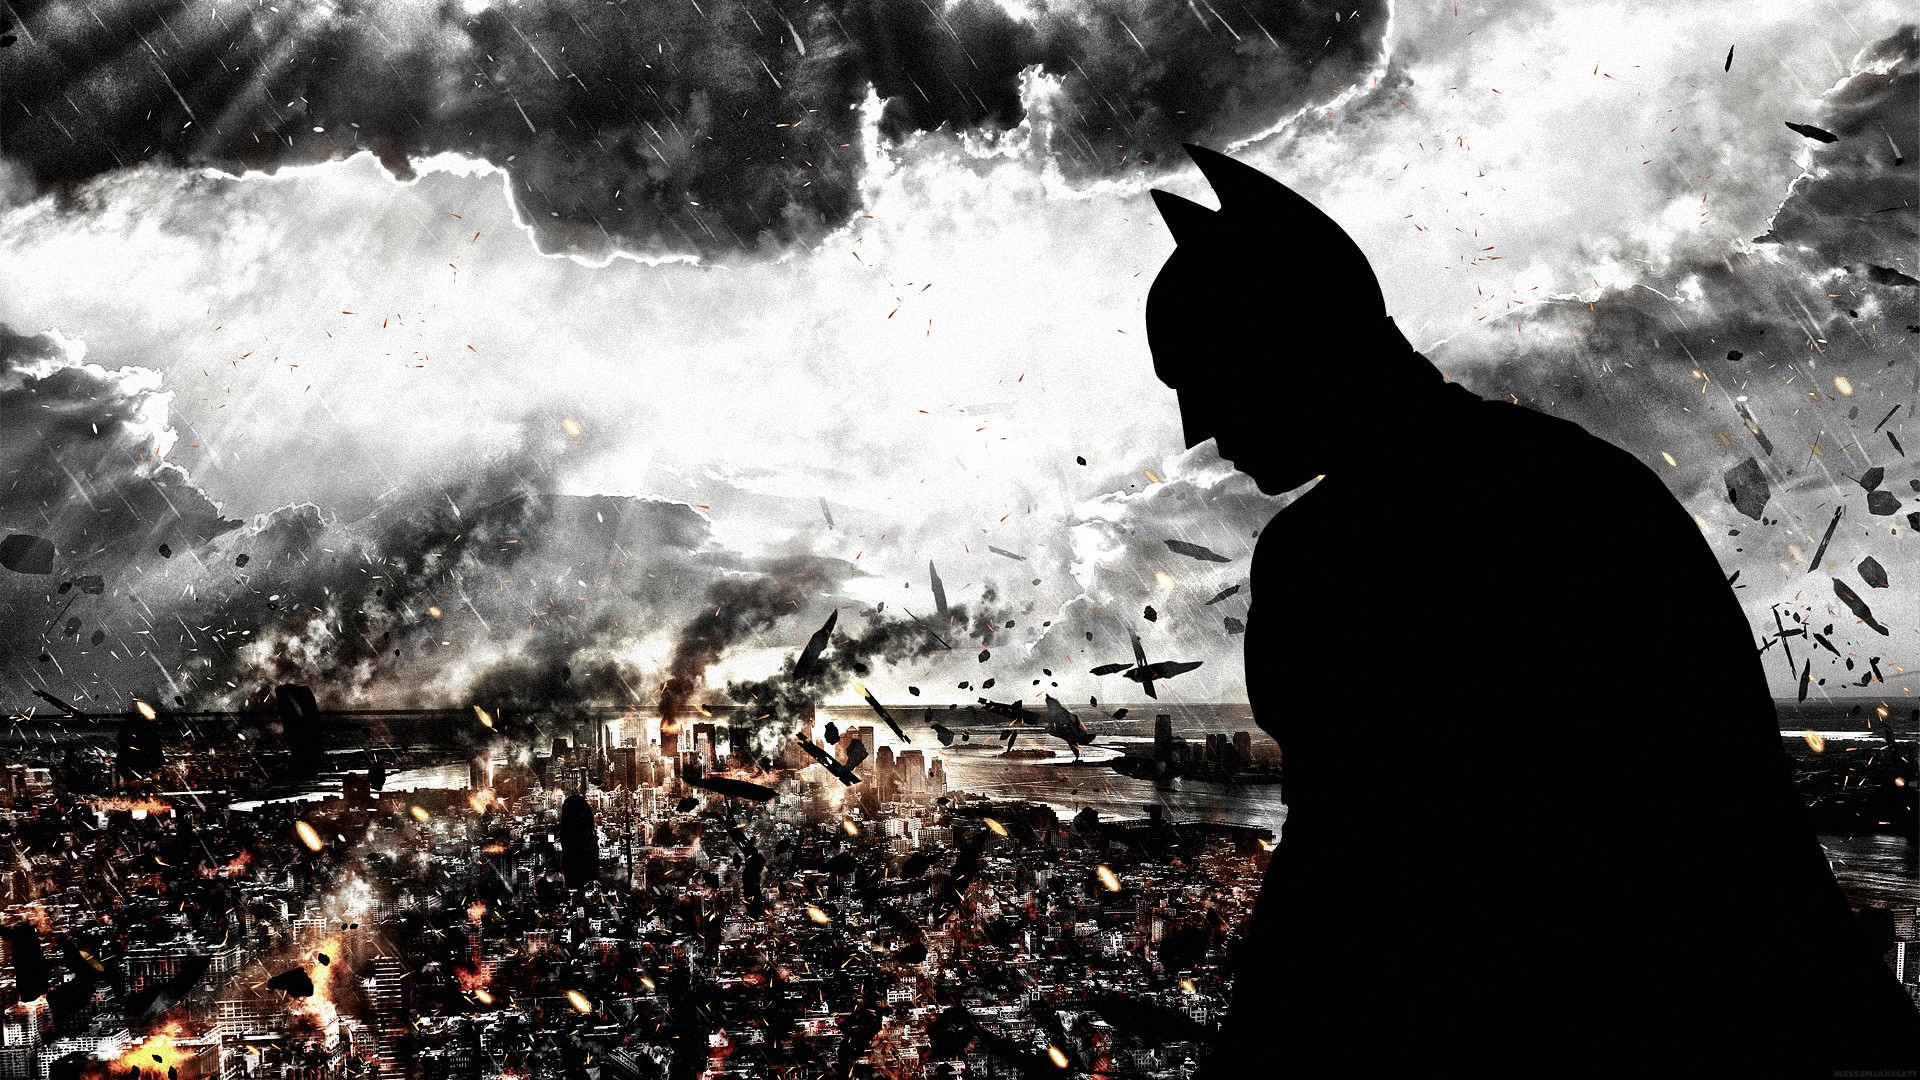 Batman Silhouette Gotham City The Dark Knight Rises Logo 40260 42